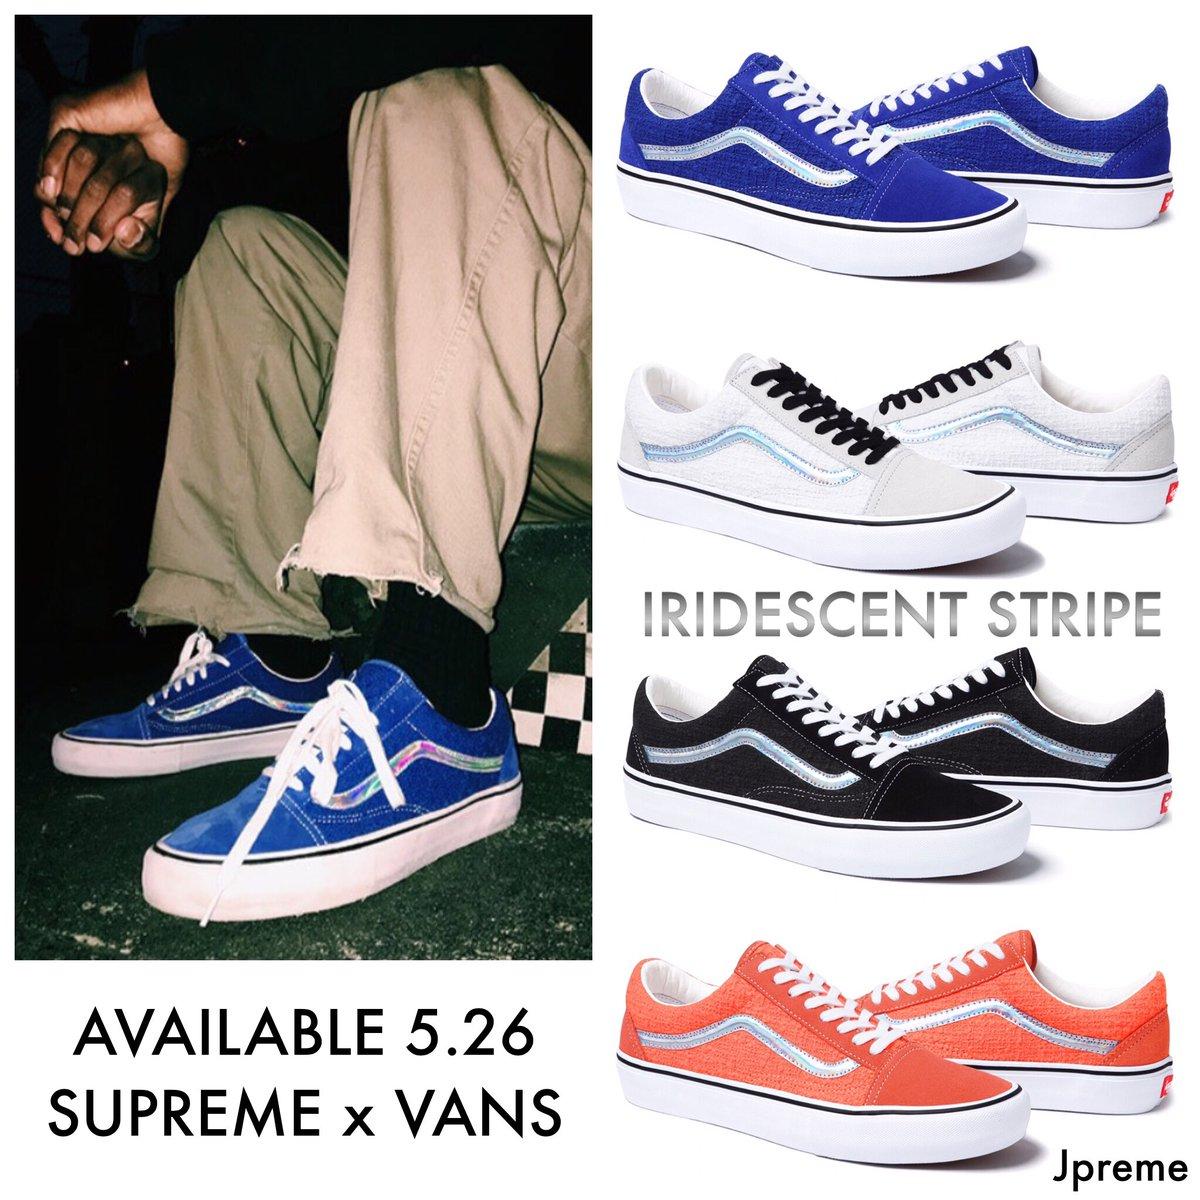 67e952018f1c22 Supreme x Vans Old Skool - Iridescent Stripe - Dropping Tomorrow pic.twitter.com maa06HkDcB